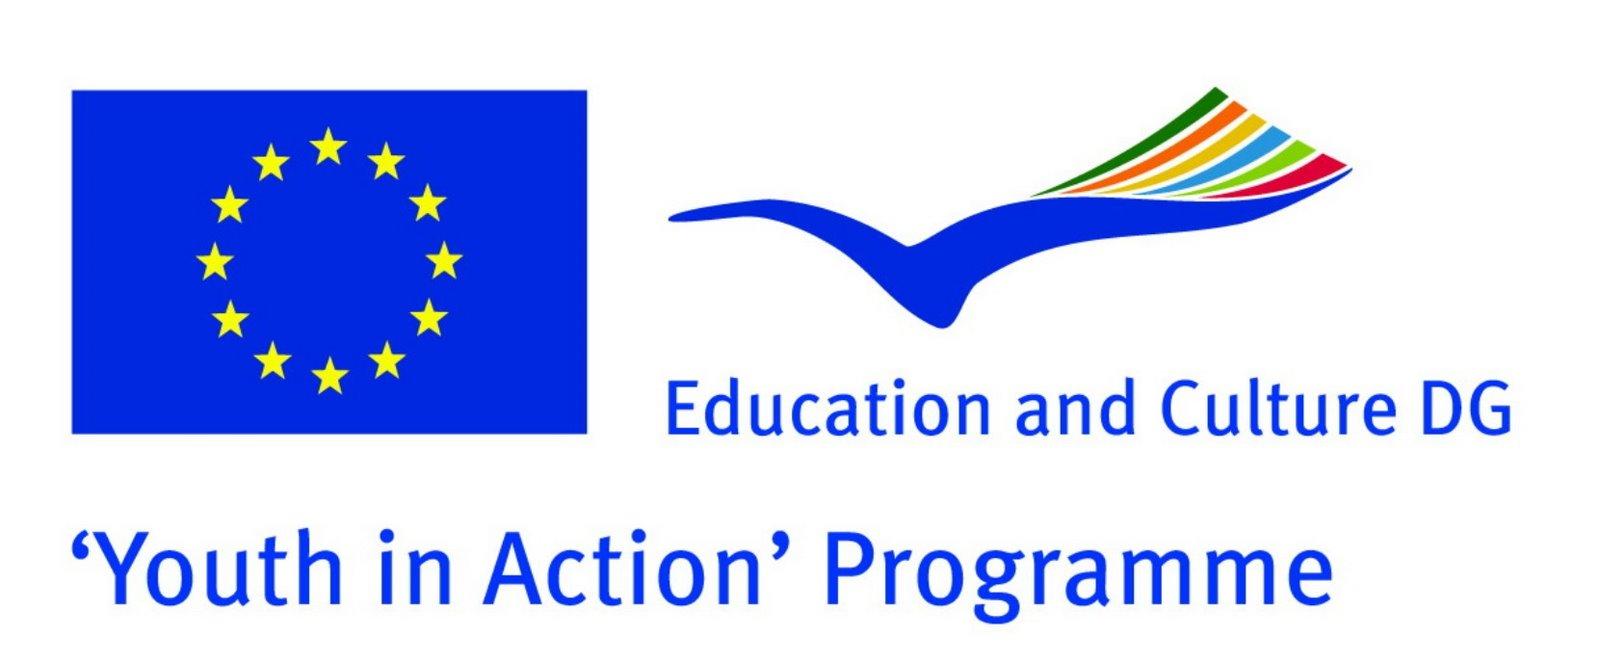 Directia Generala de Educatie si Cultura